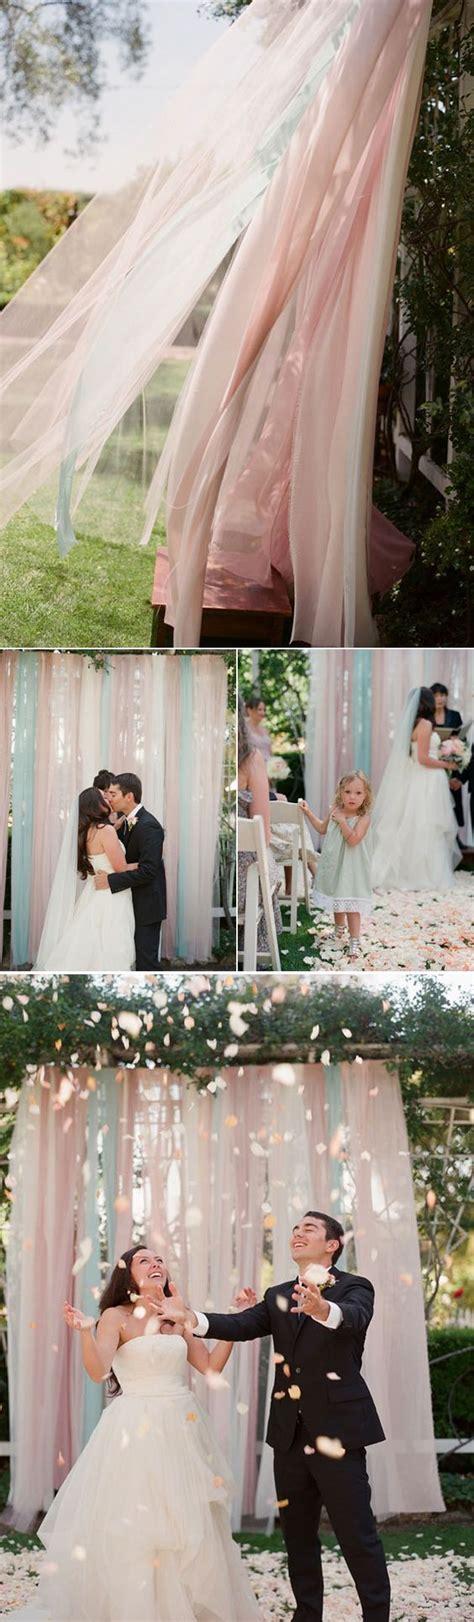 aqua pink wedding ceremony tulle fabric backdrop idea